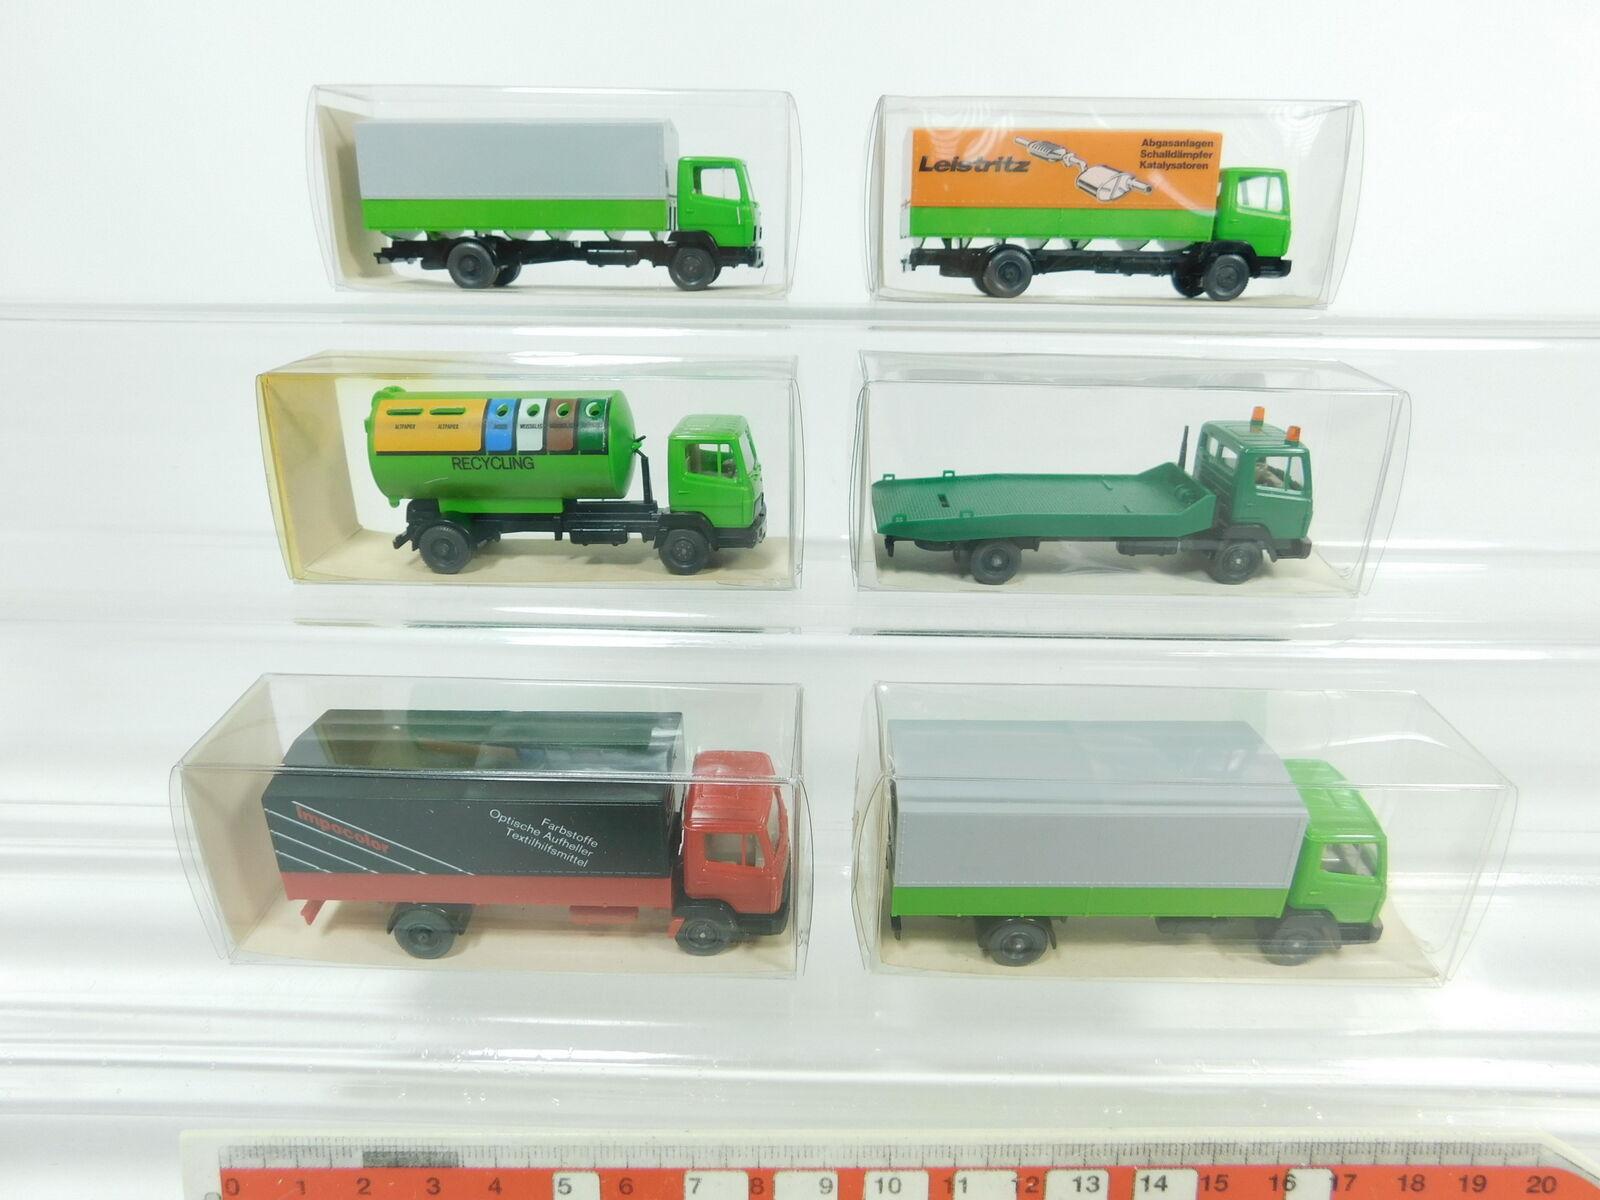 BD321-0,5x Wiking H0 1 87 LKW Mercedes MB MB MB  431+633+643 Recycling, NEUW+OVP 5bd38a